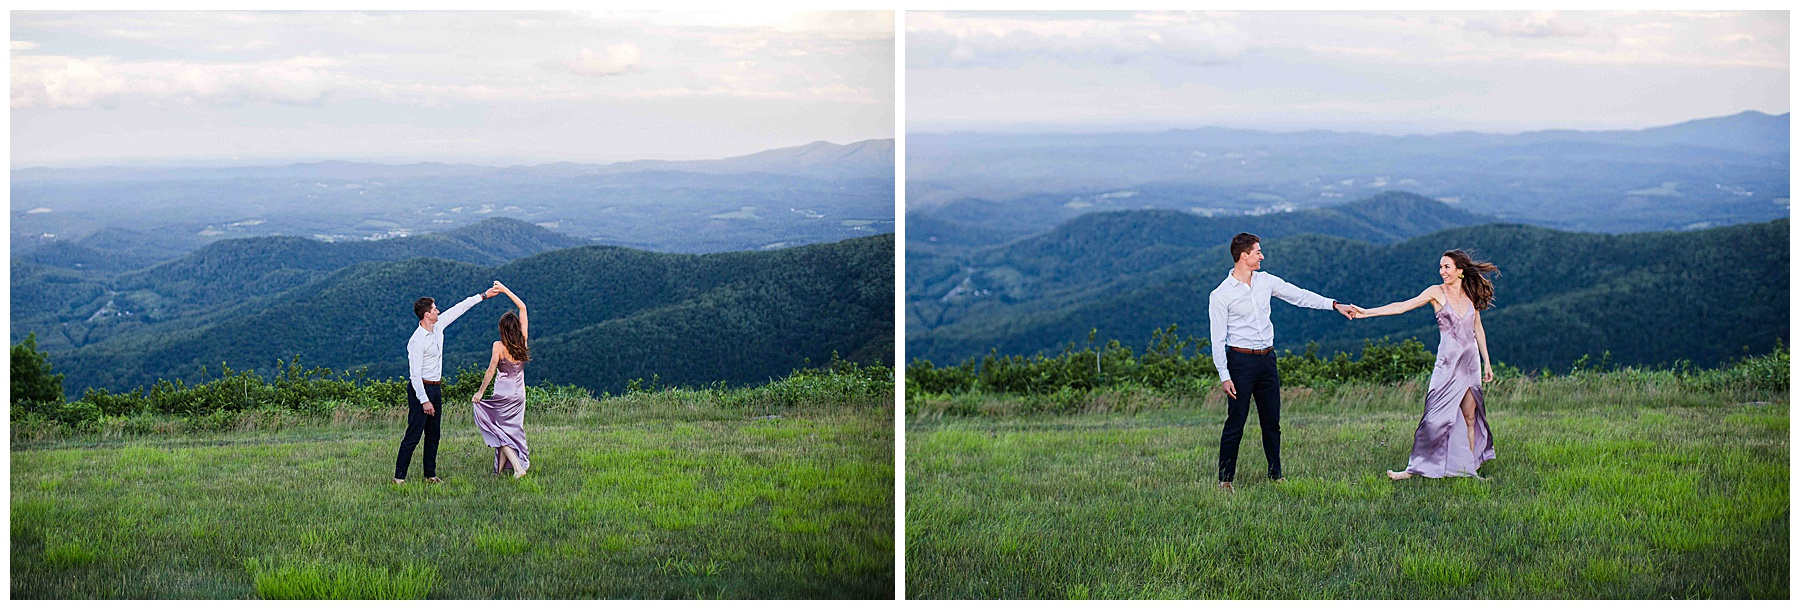 virginia-blue-ridge-mountain-engagement5.jpg